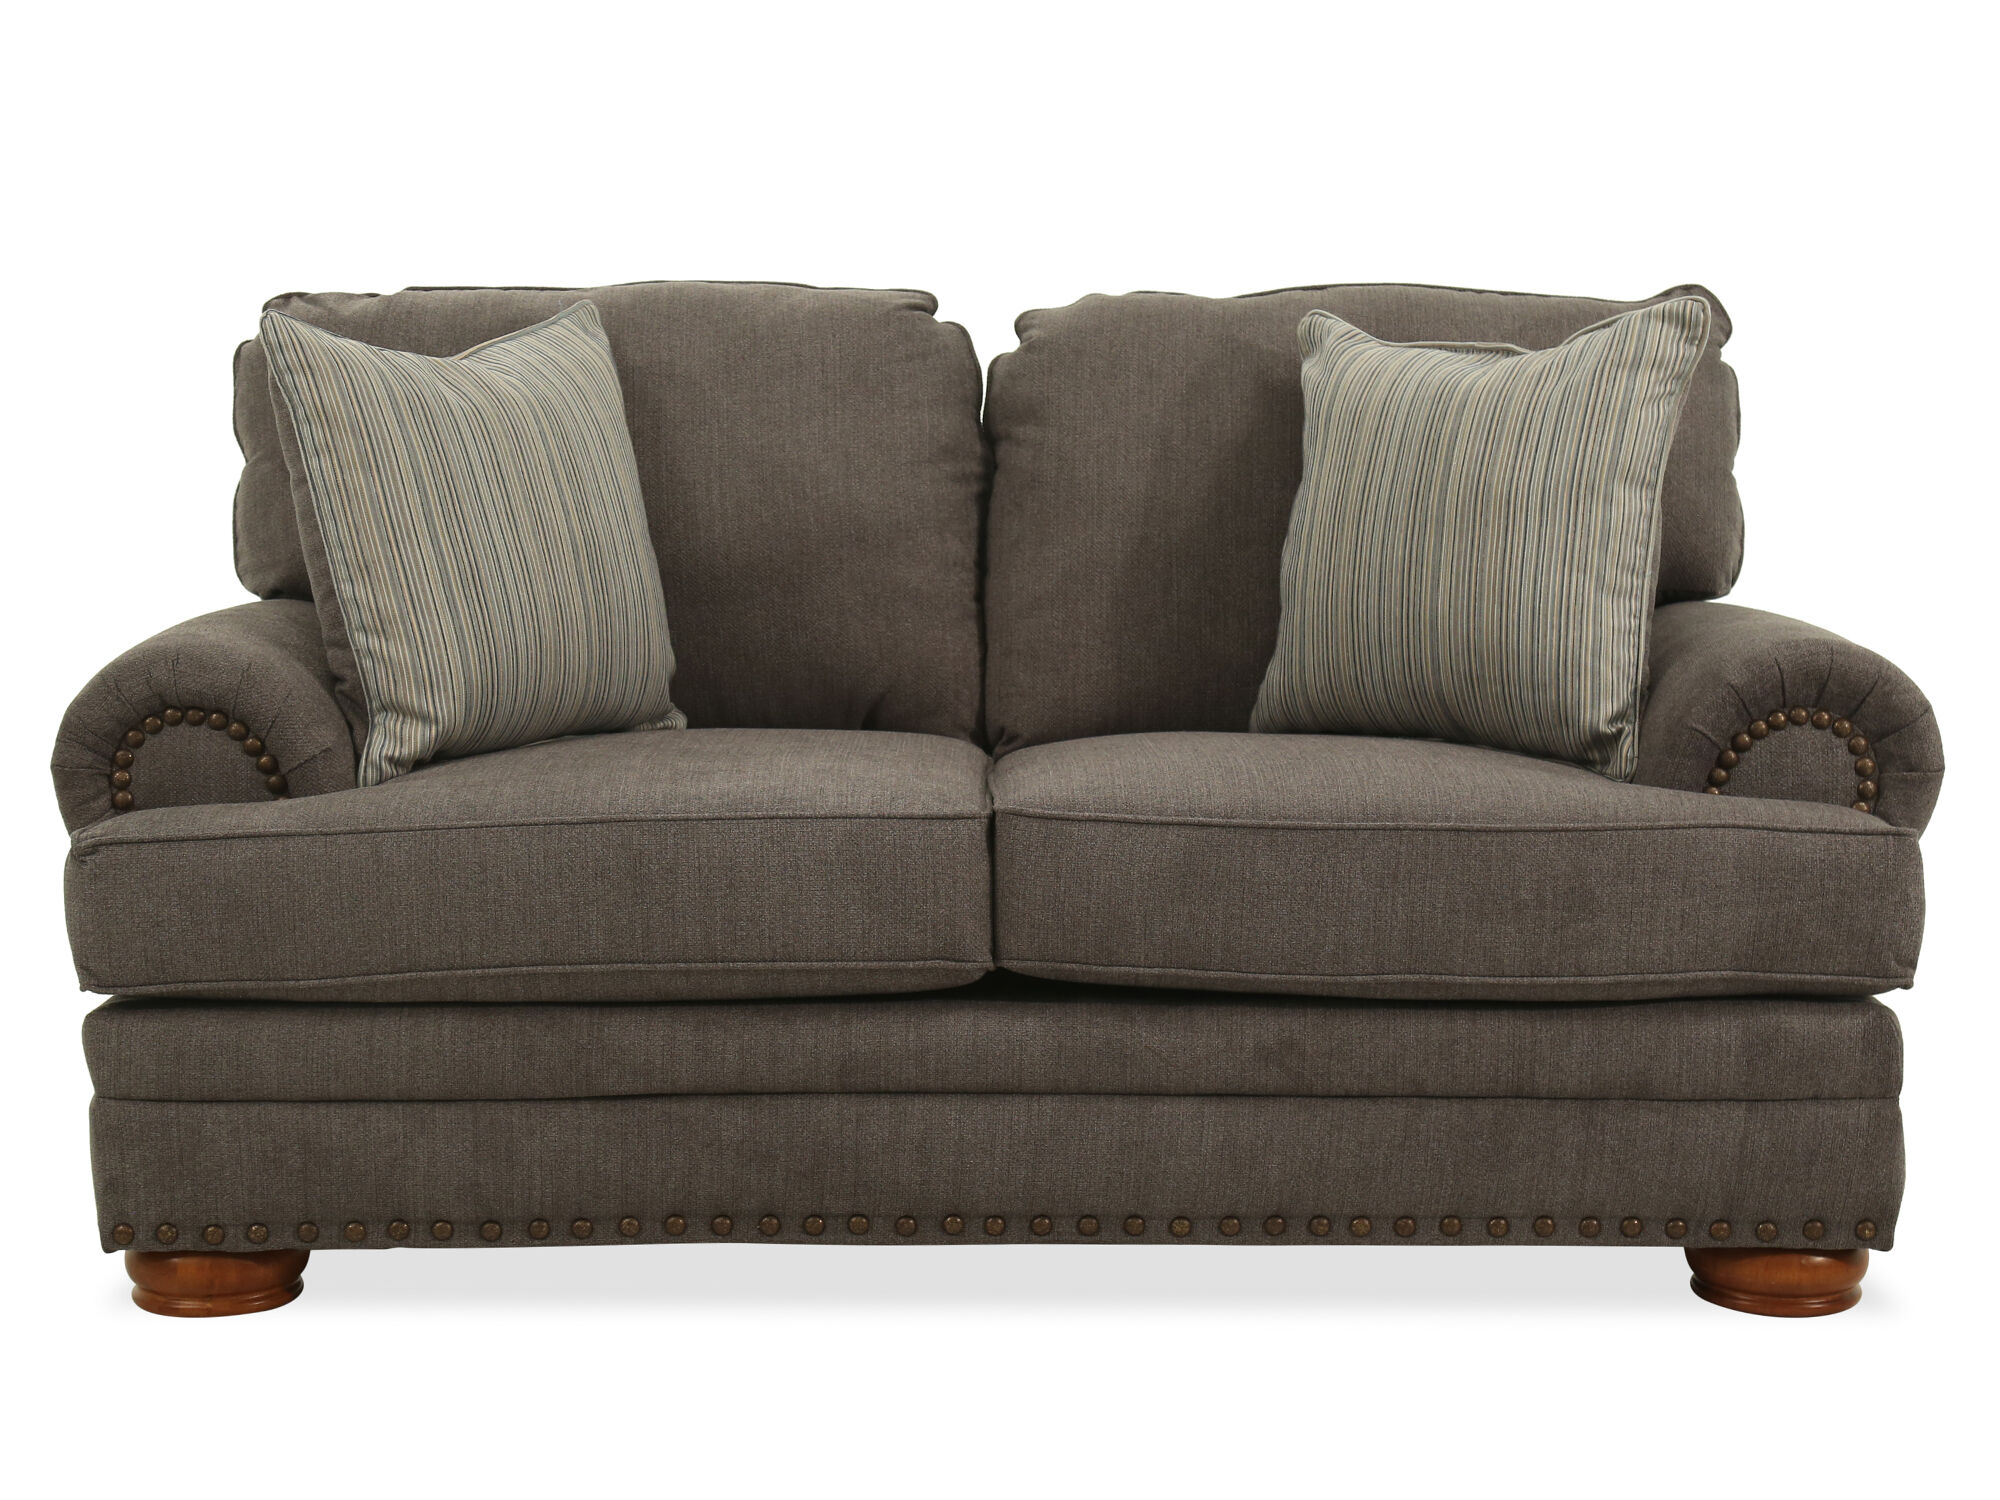 michael nicholas aspen sofa sofabord design selv lane furniture | mathis brothers